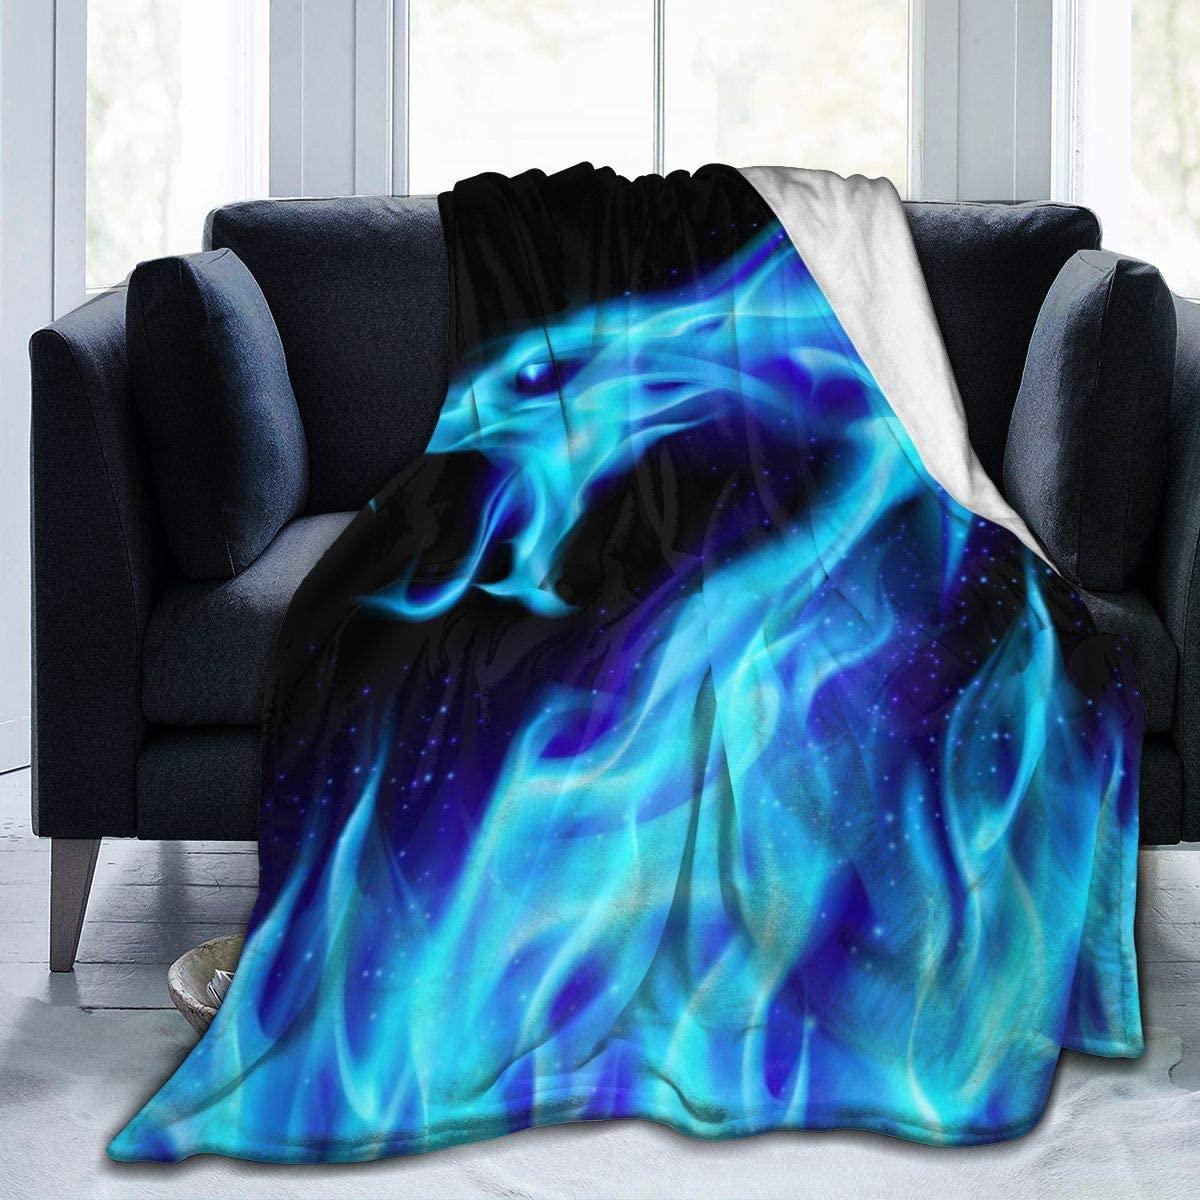 Micro Fleece Plush Soft Baby Blanket Abstract Blue Fiery Dragon Fire Black Fluffy Warm Toddler Bed/Crib Blanket Lightweight Flannel Daycare Nap Kids Sleeping Tummy Time Throw Blanket Girls Boy Kid/Bab